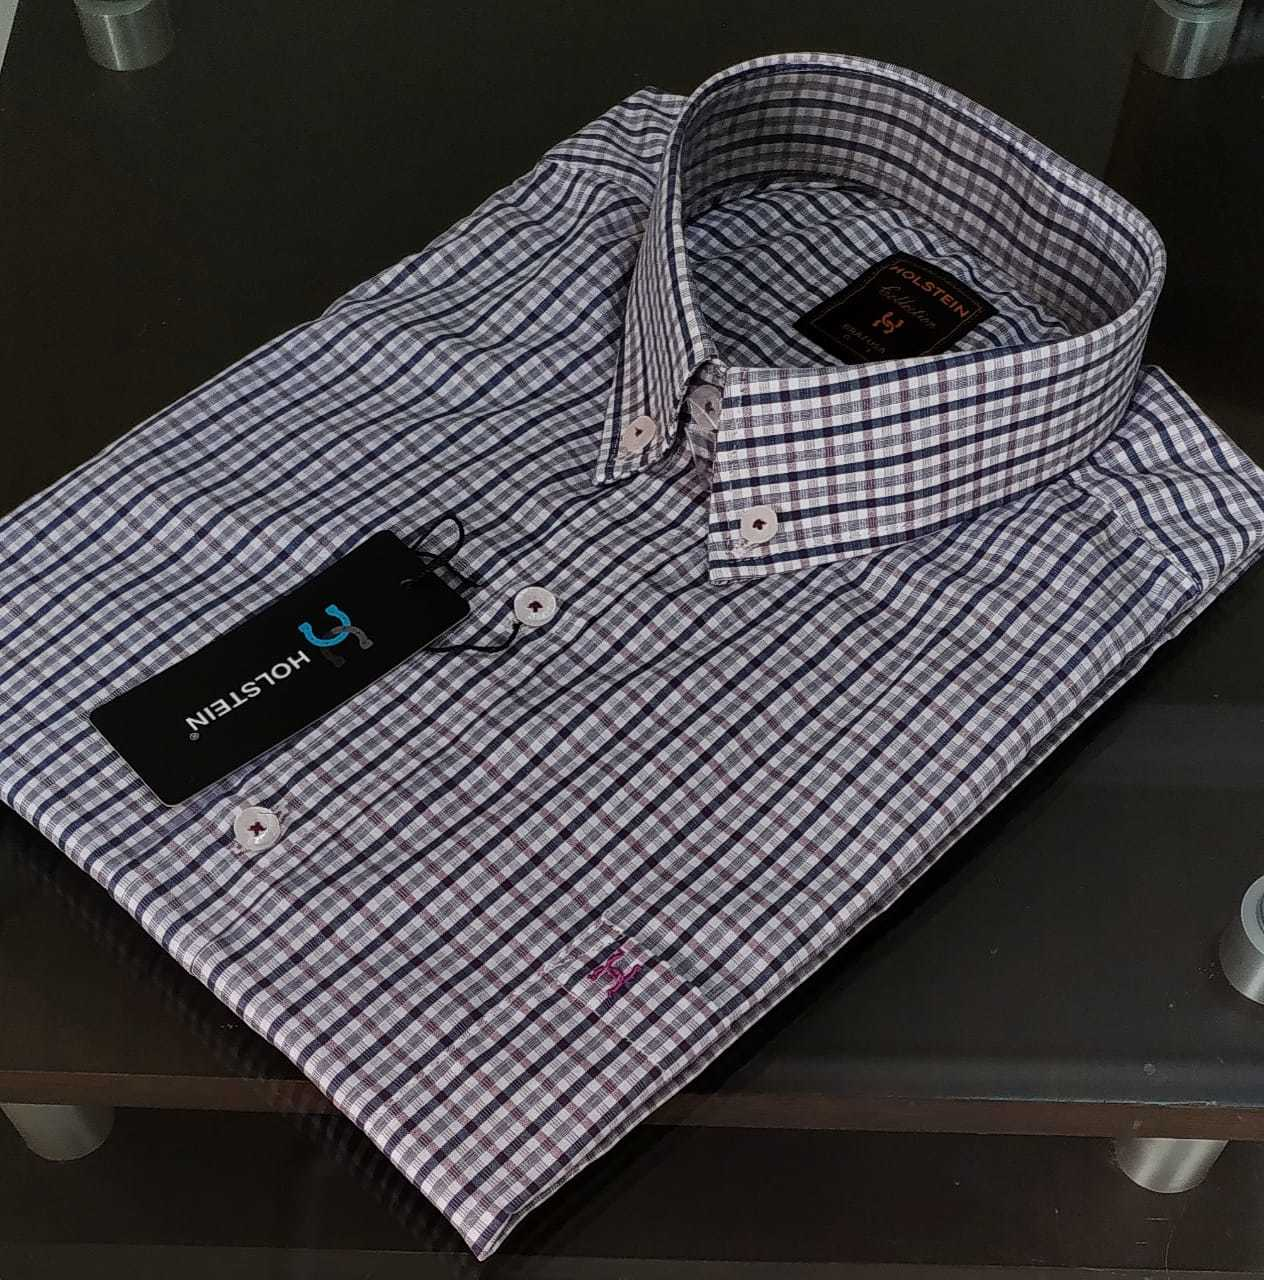 Camisa Manga Curta Holstein.